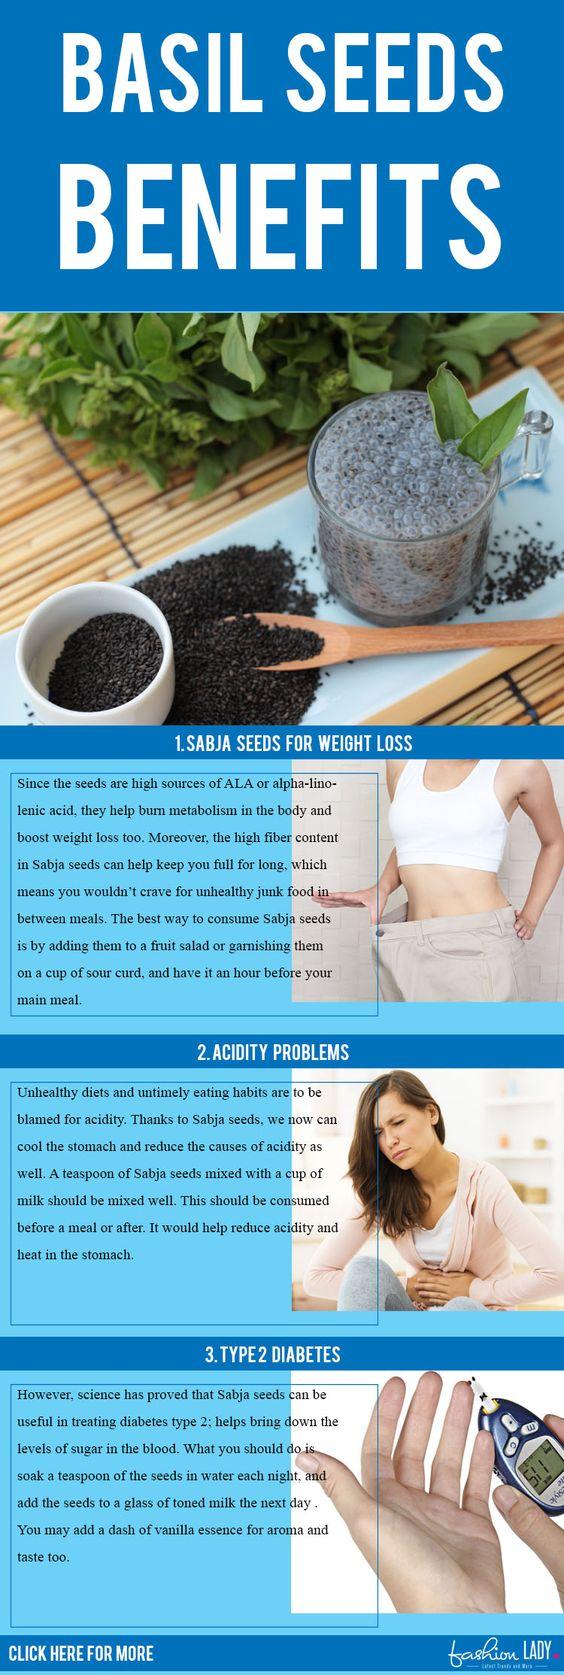 22 Hidden Basil Seeds Sabja Seeds Benefits For Health